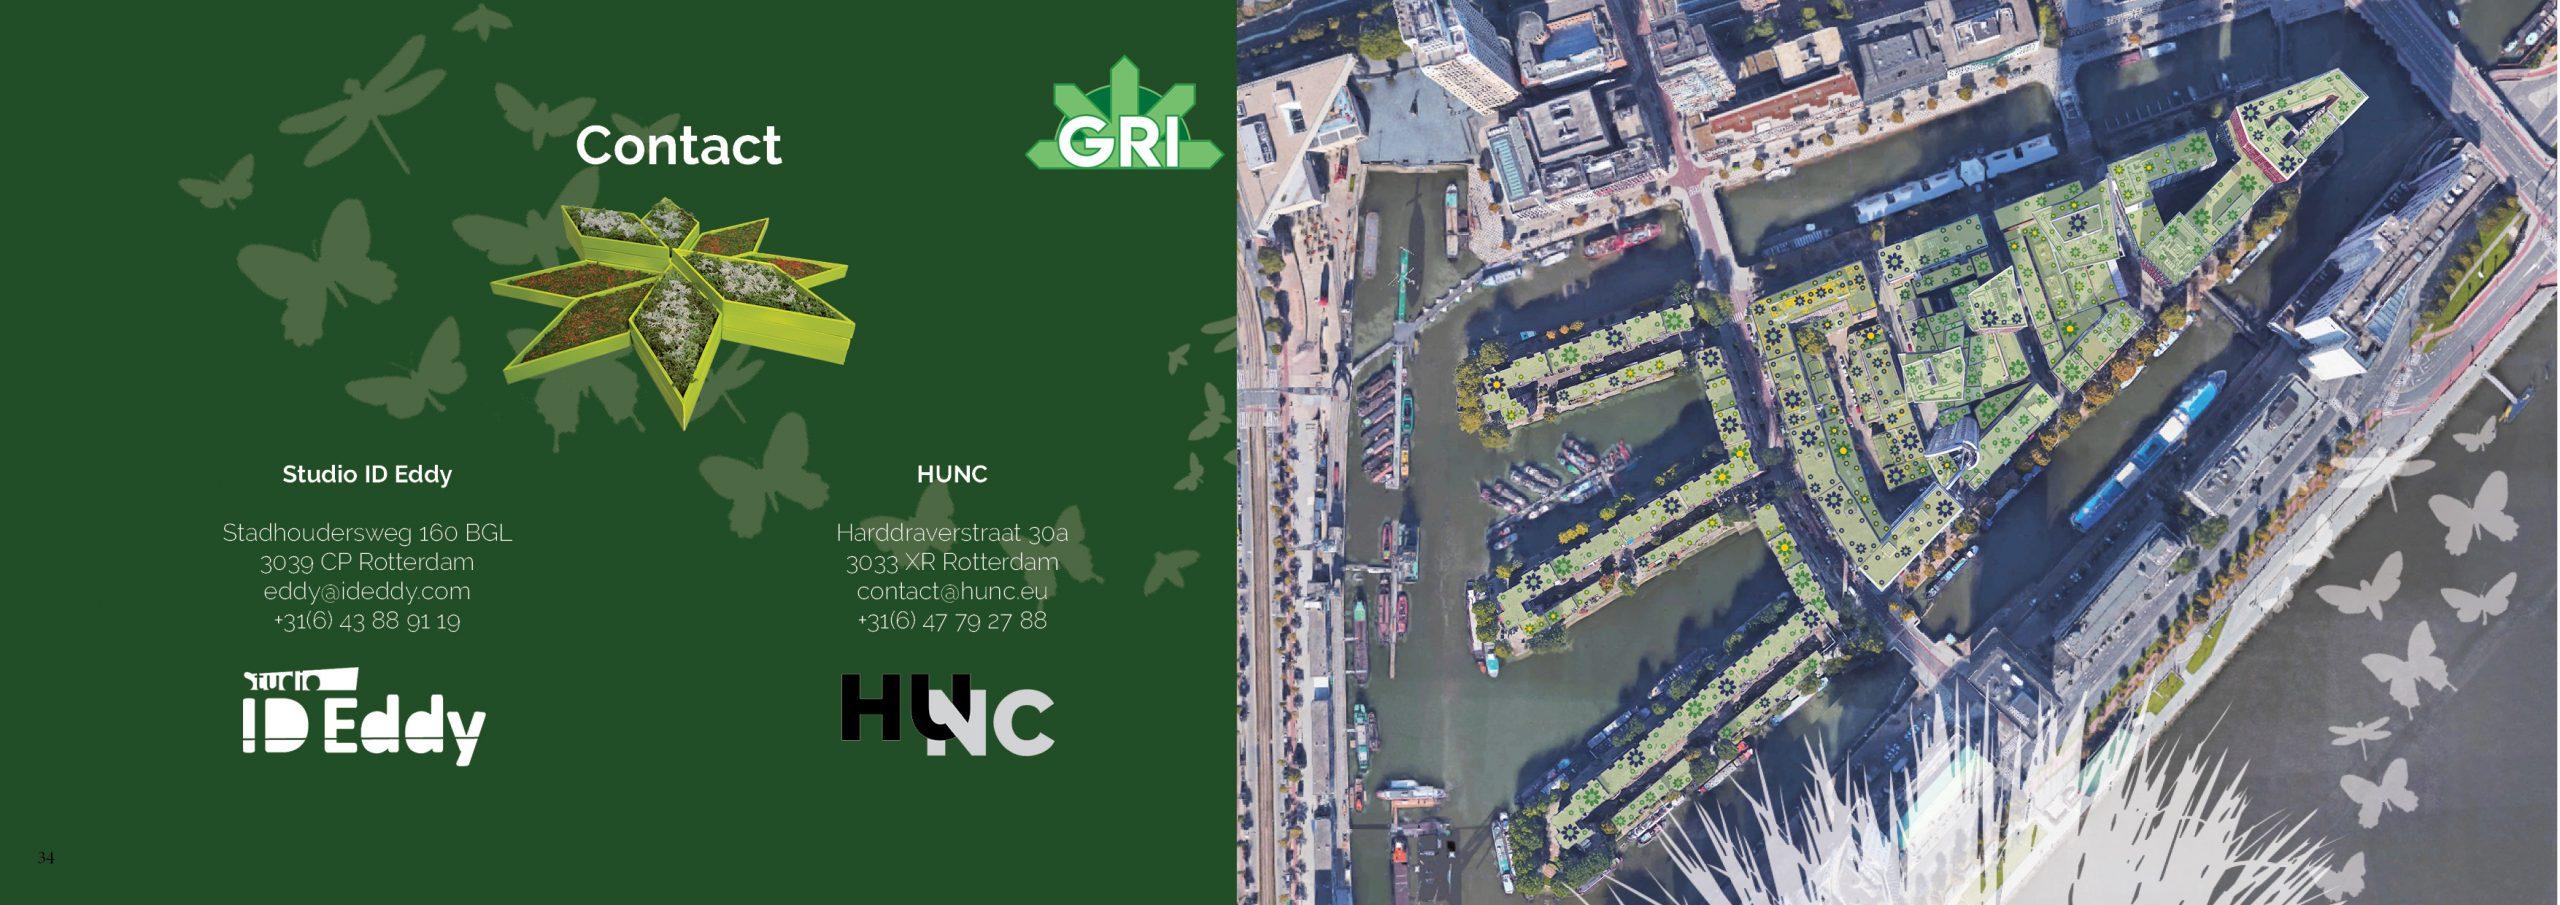 Green Roof Initiative